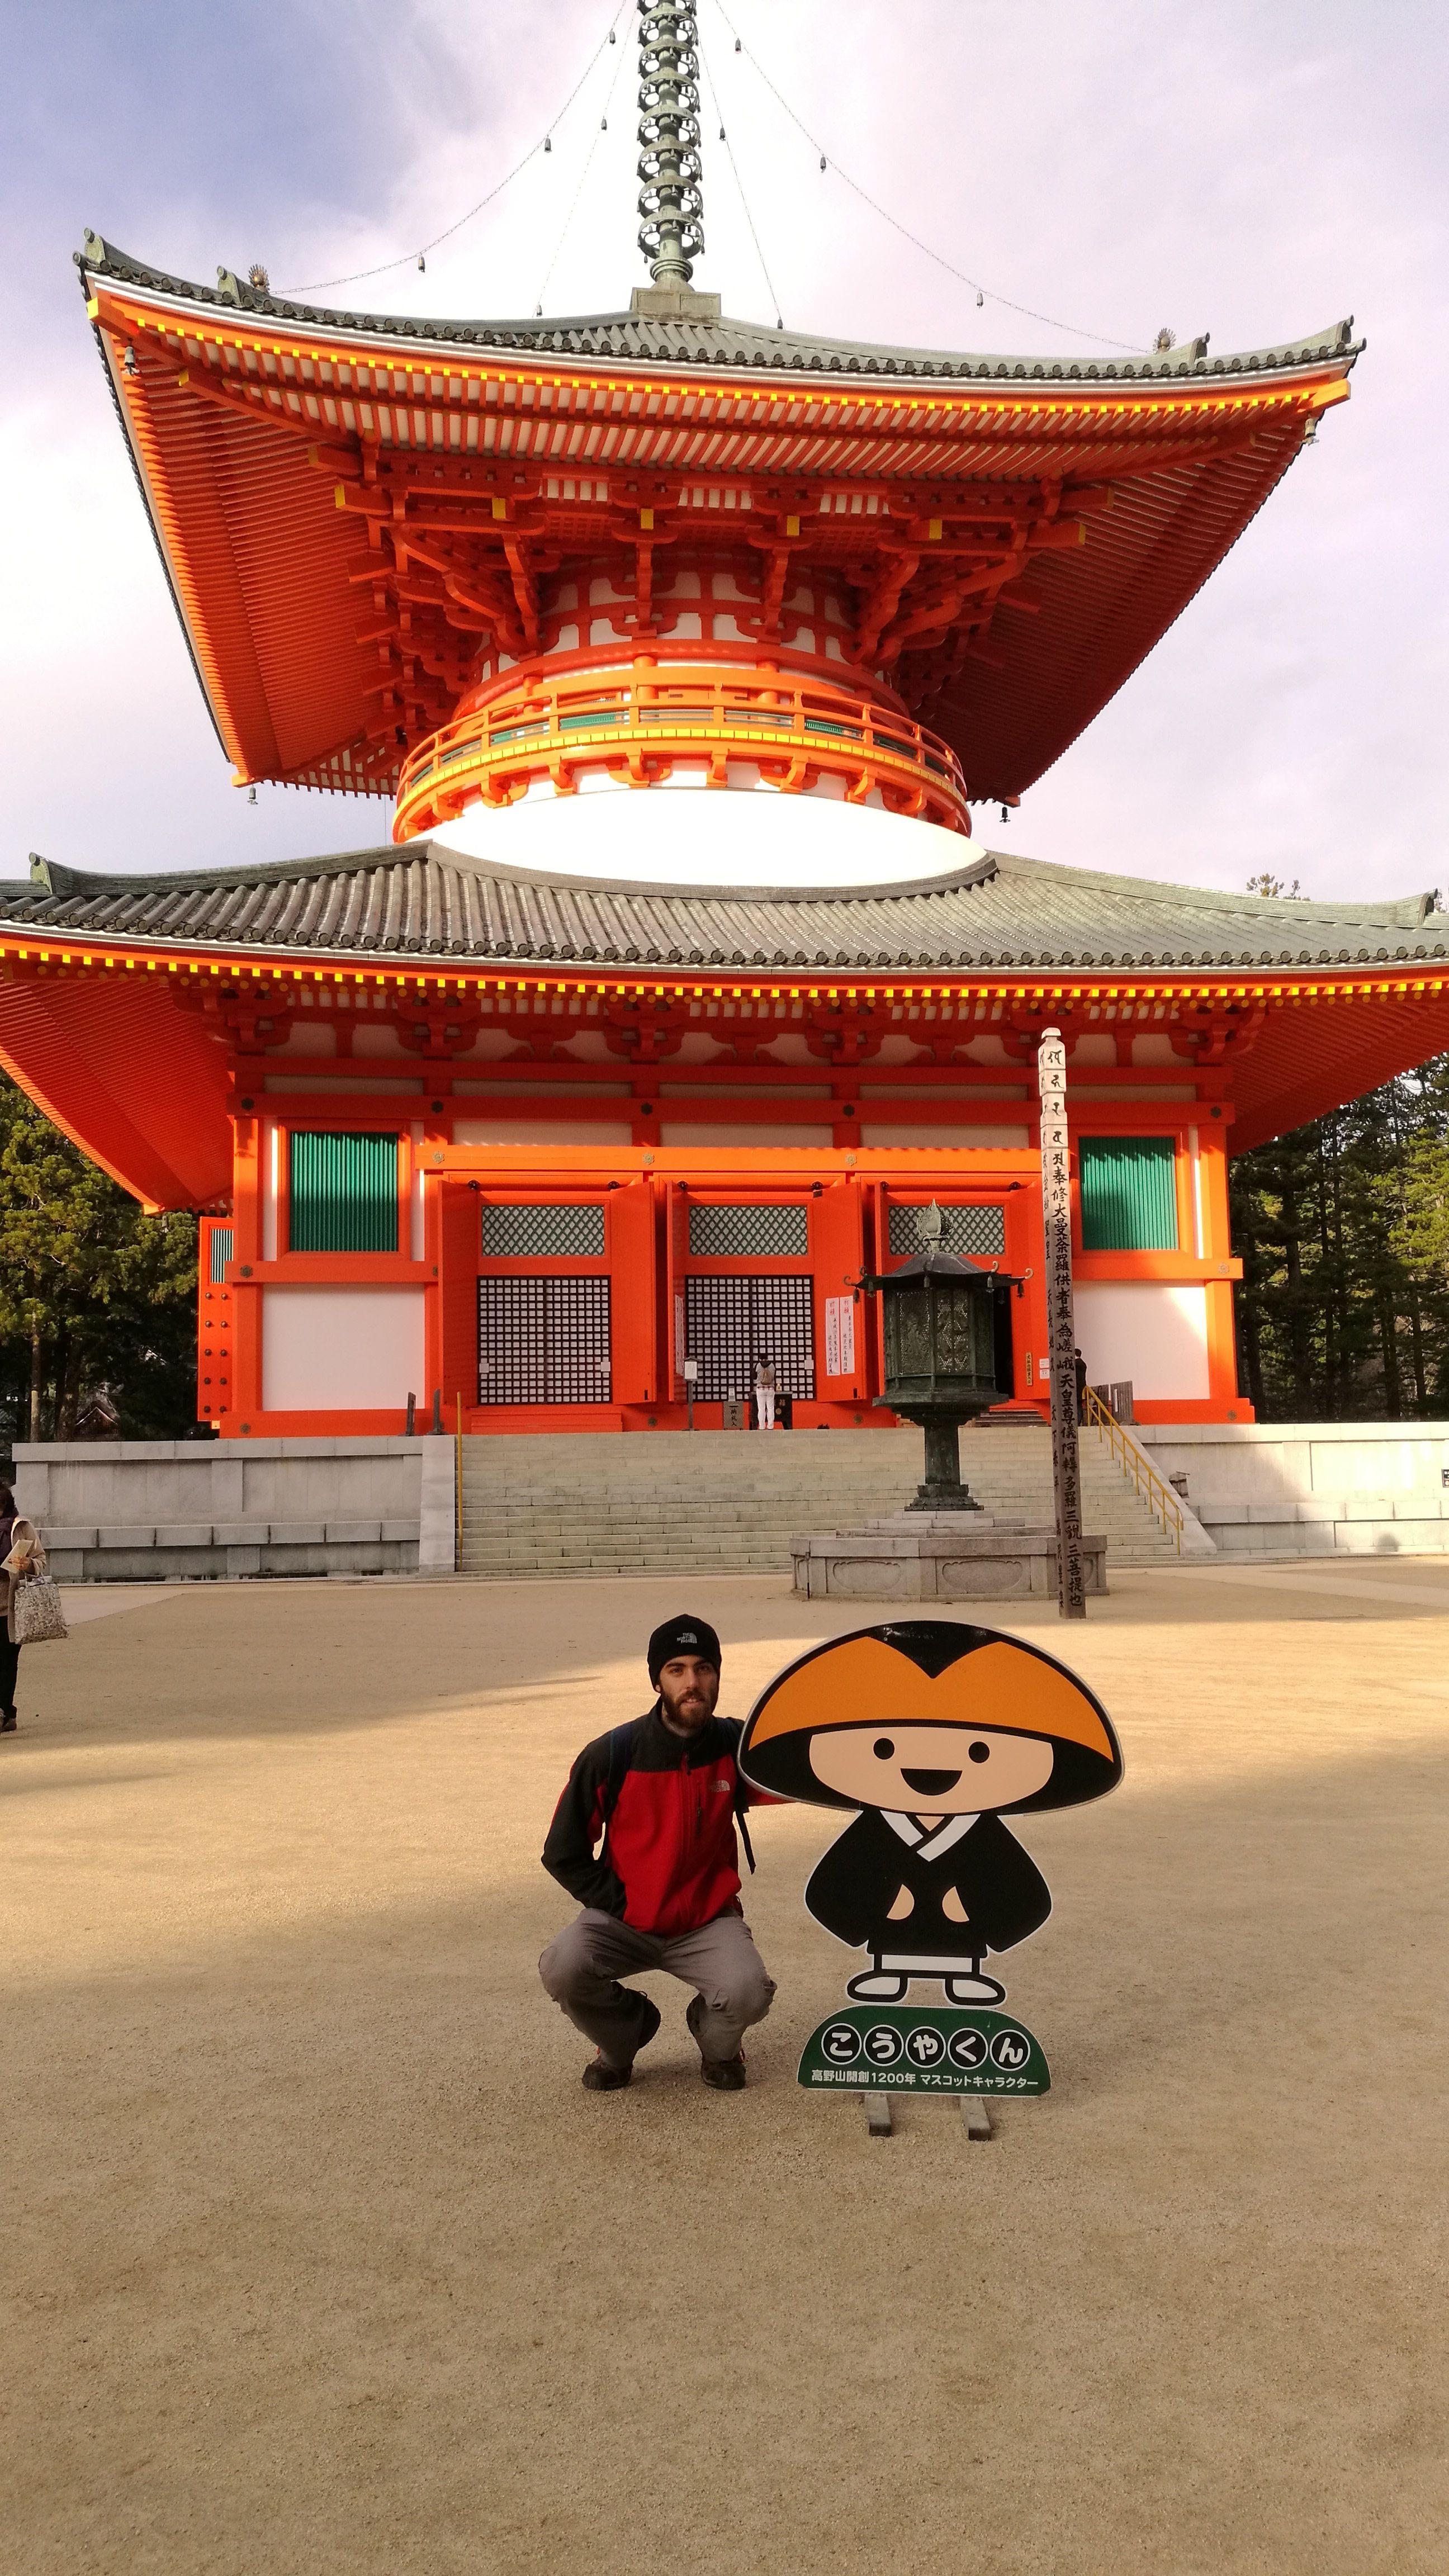 Con el monje Kawaii, símbolo de Koyasan